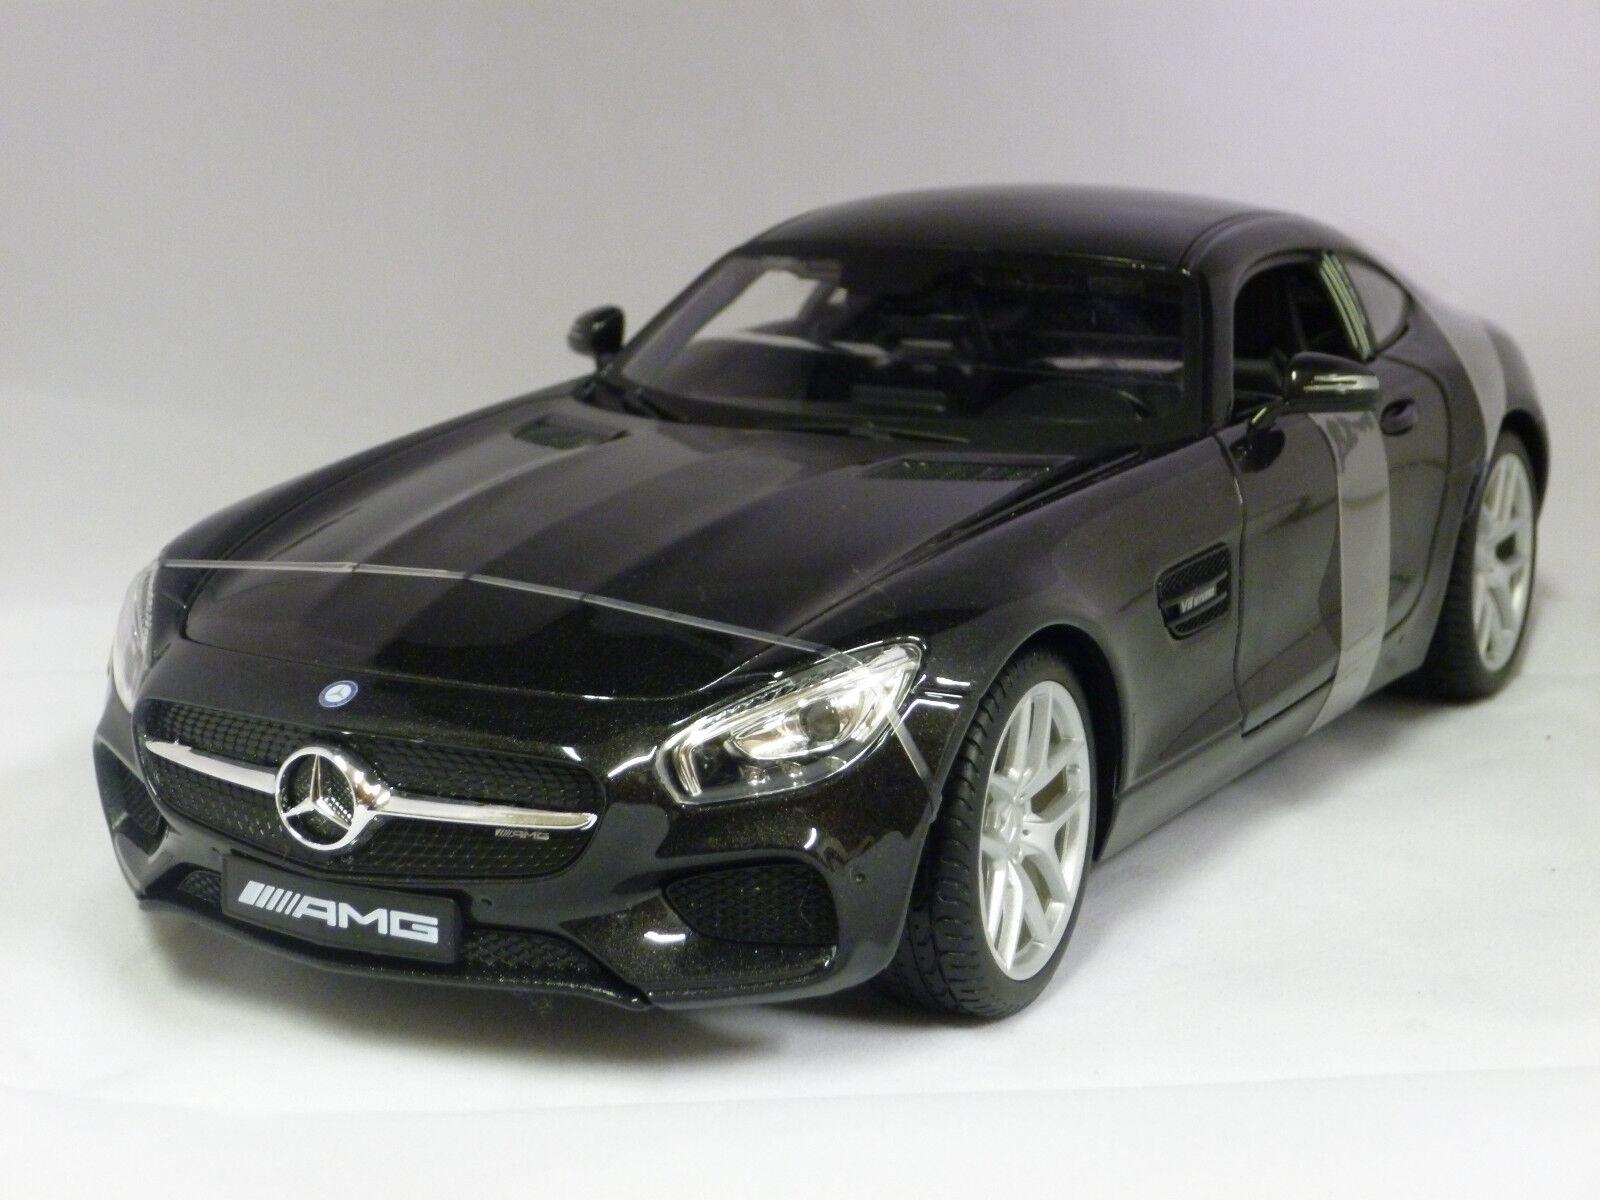 Burago Mercedes-AMG GT  Die Cast Model Car 1 18 Scale Diecast